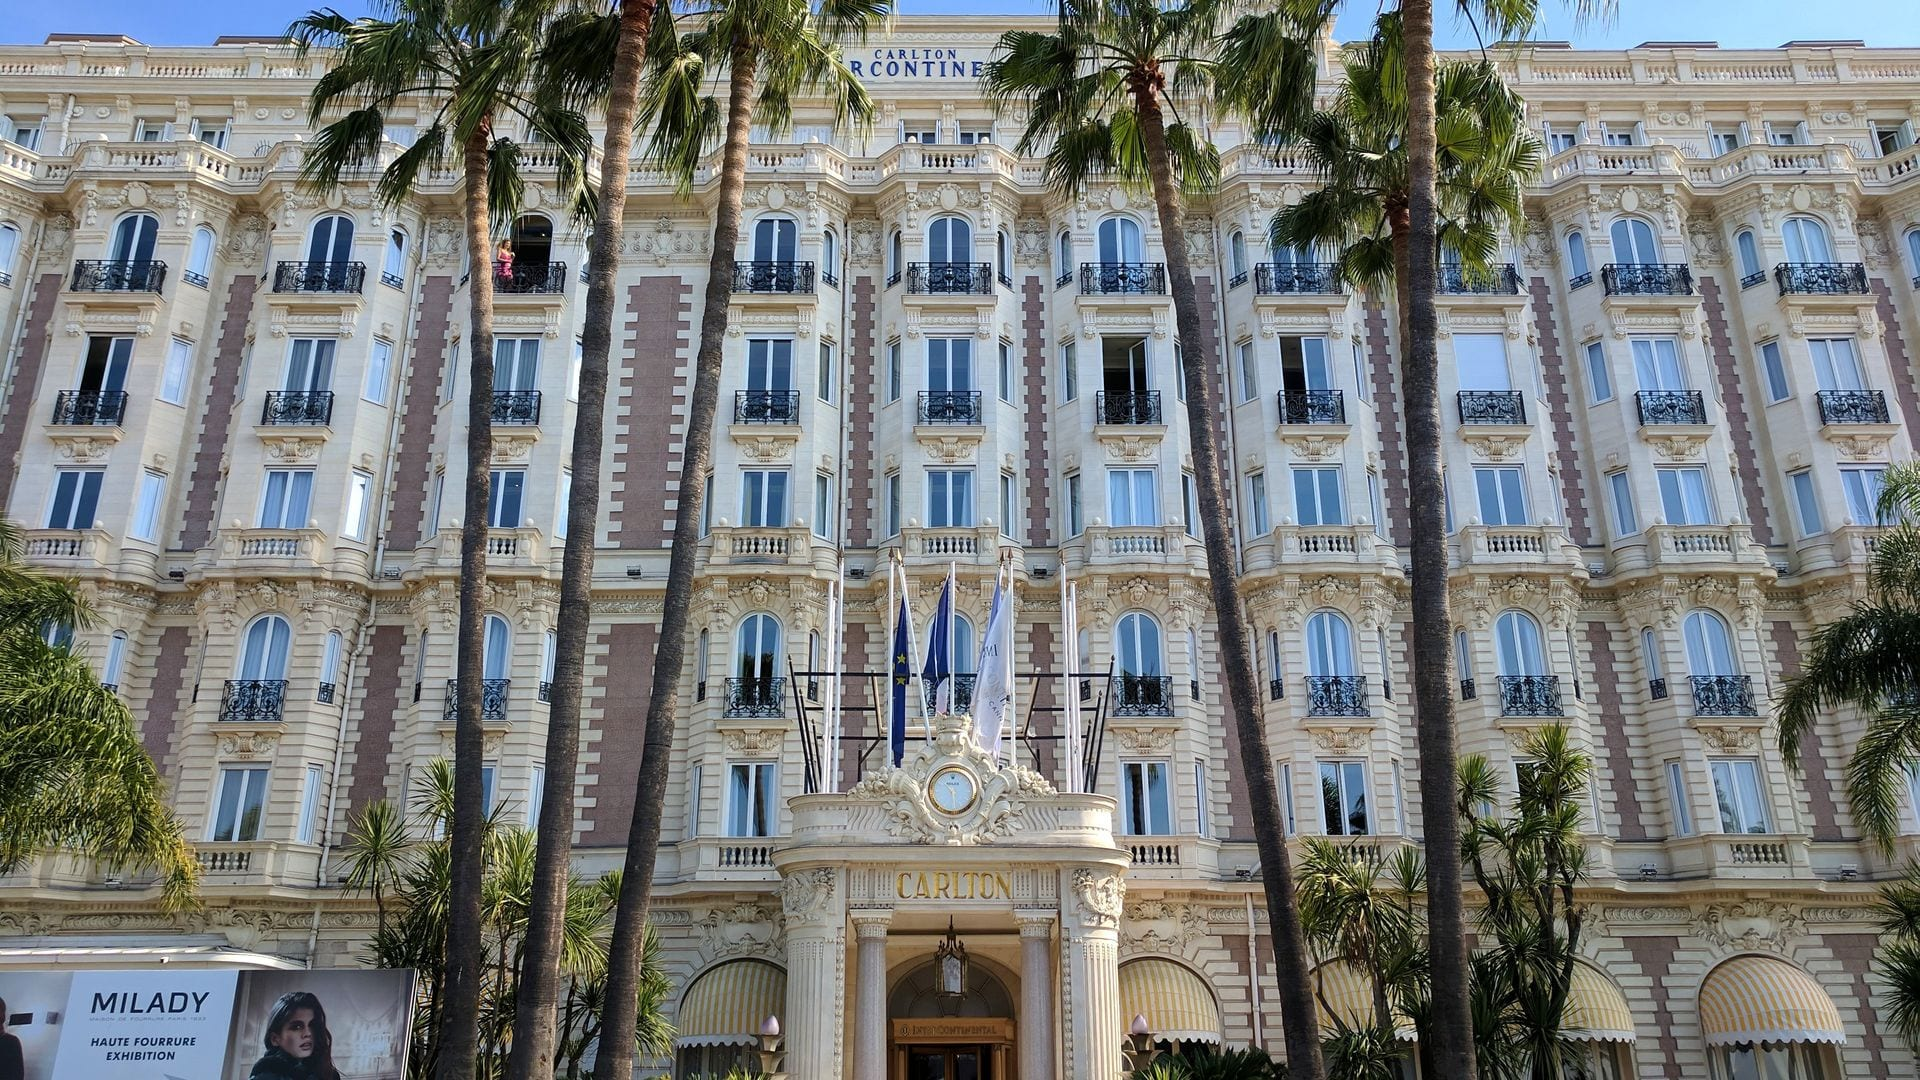 L'InterContinental Carlton à Cannes